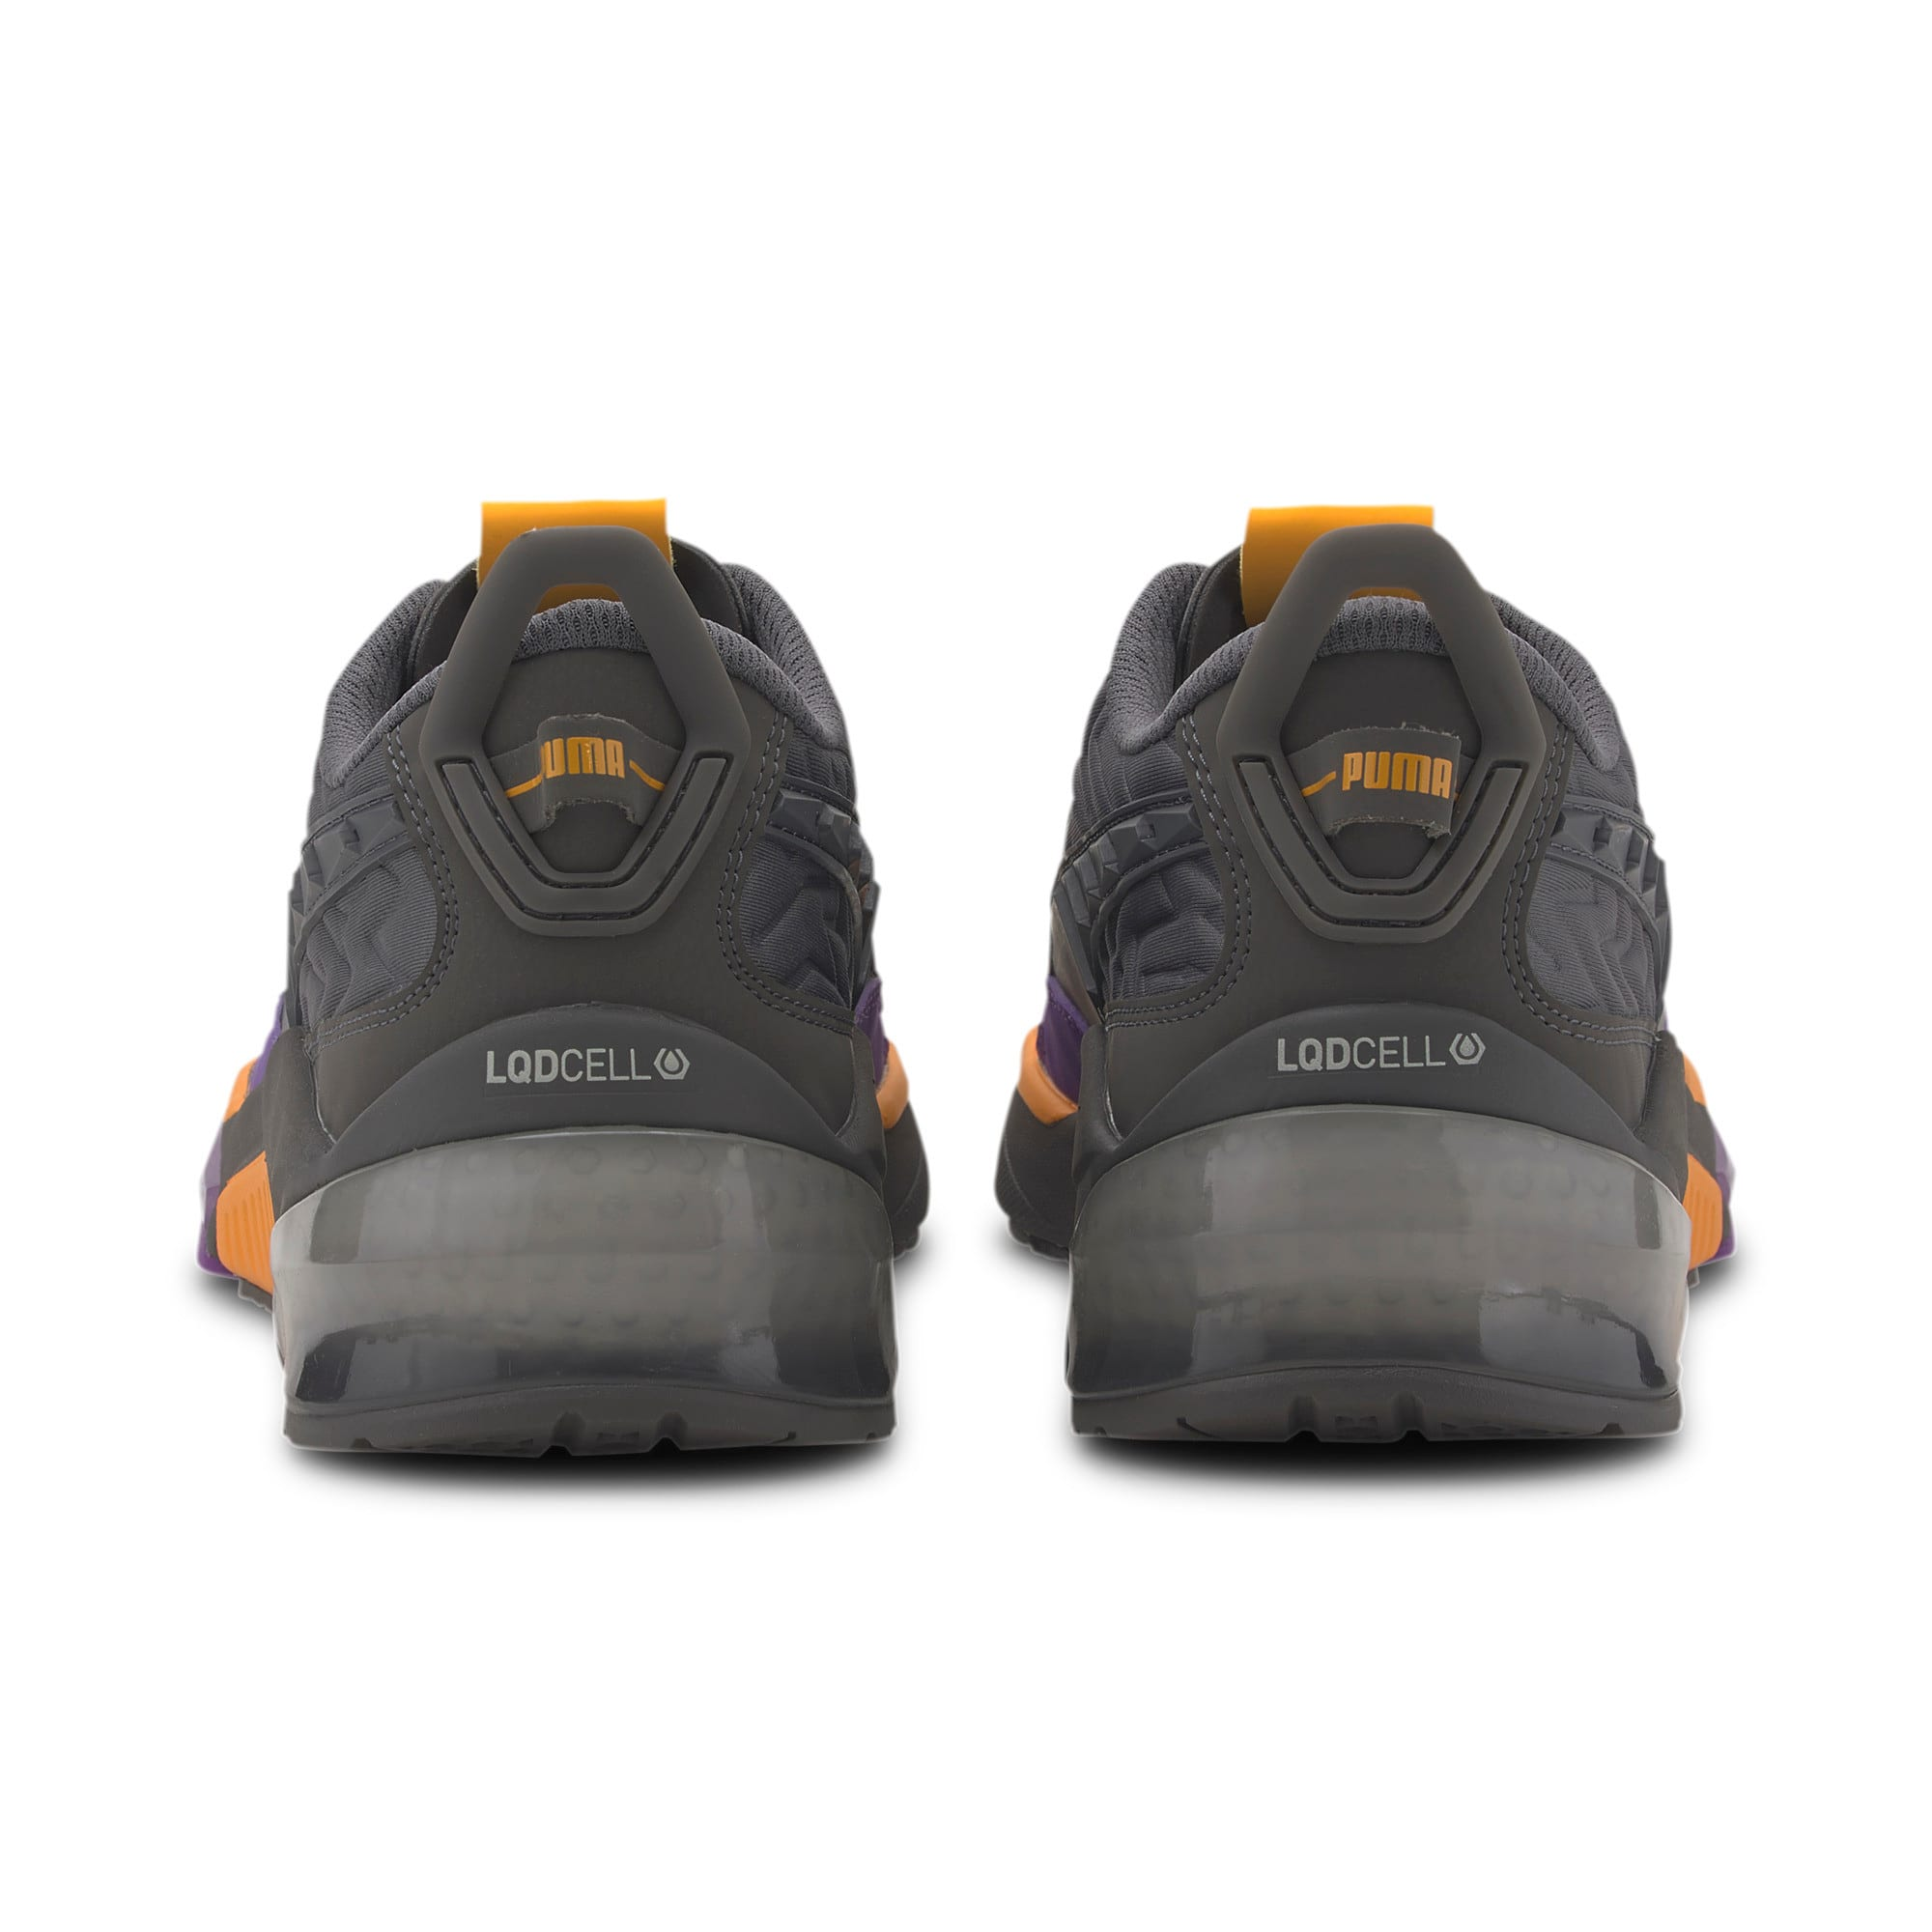 Thumbnail 3 of LQDCELL Optic Rave Men's Running Shoes, CASTLEROCK-Purple Glimmer, medium